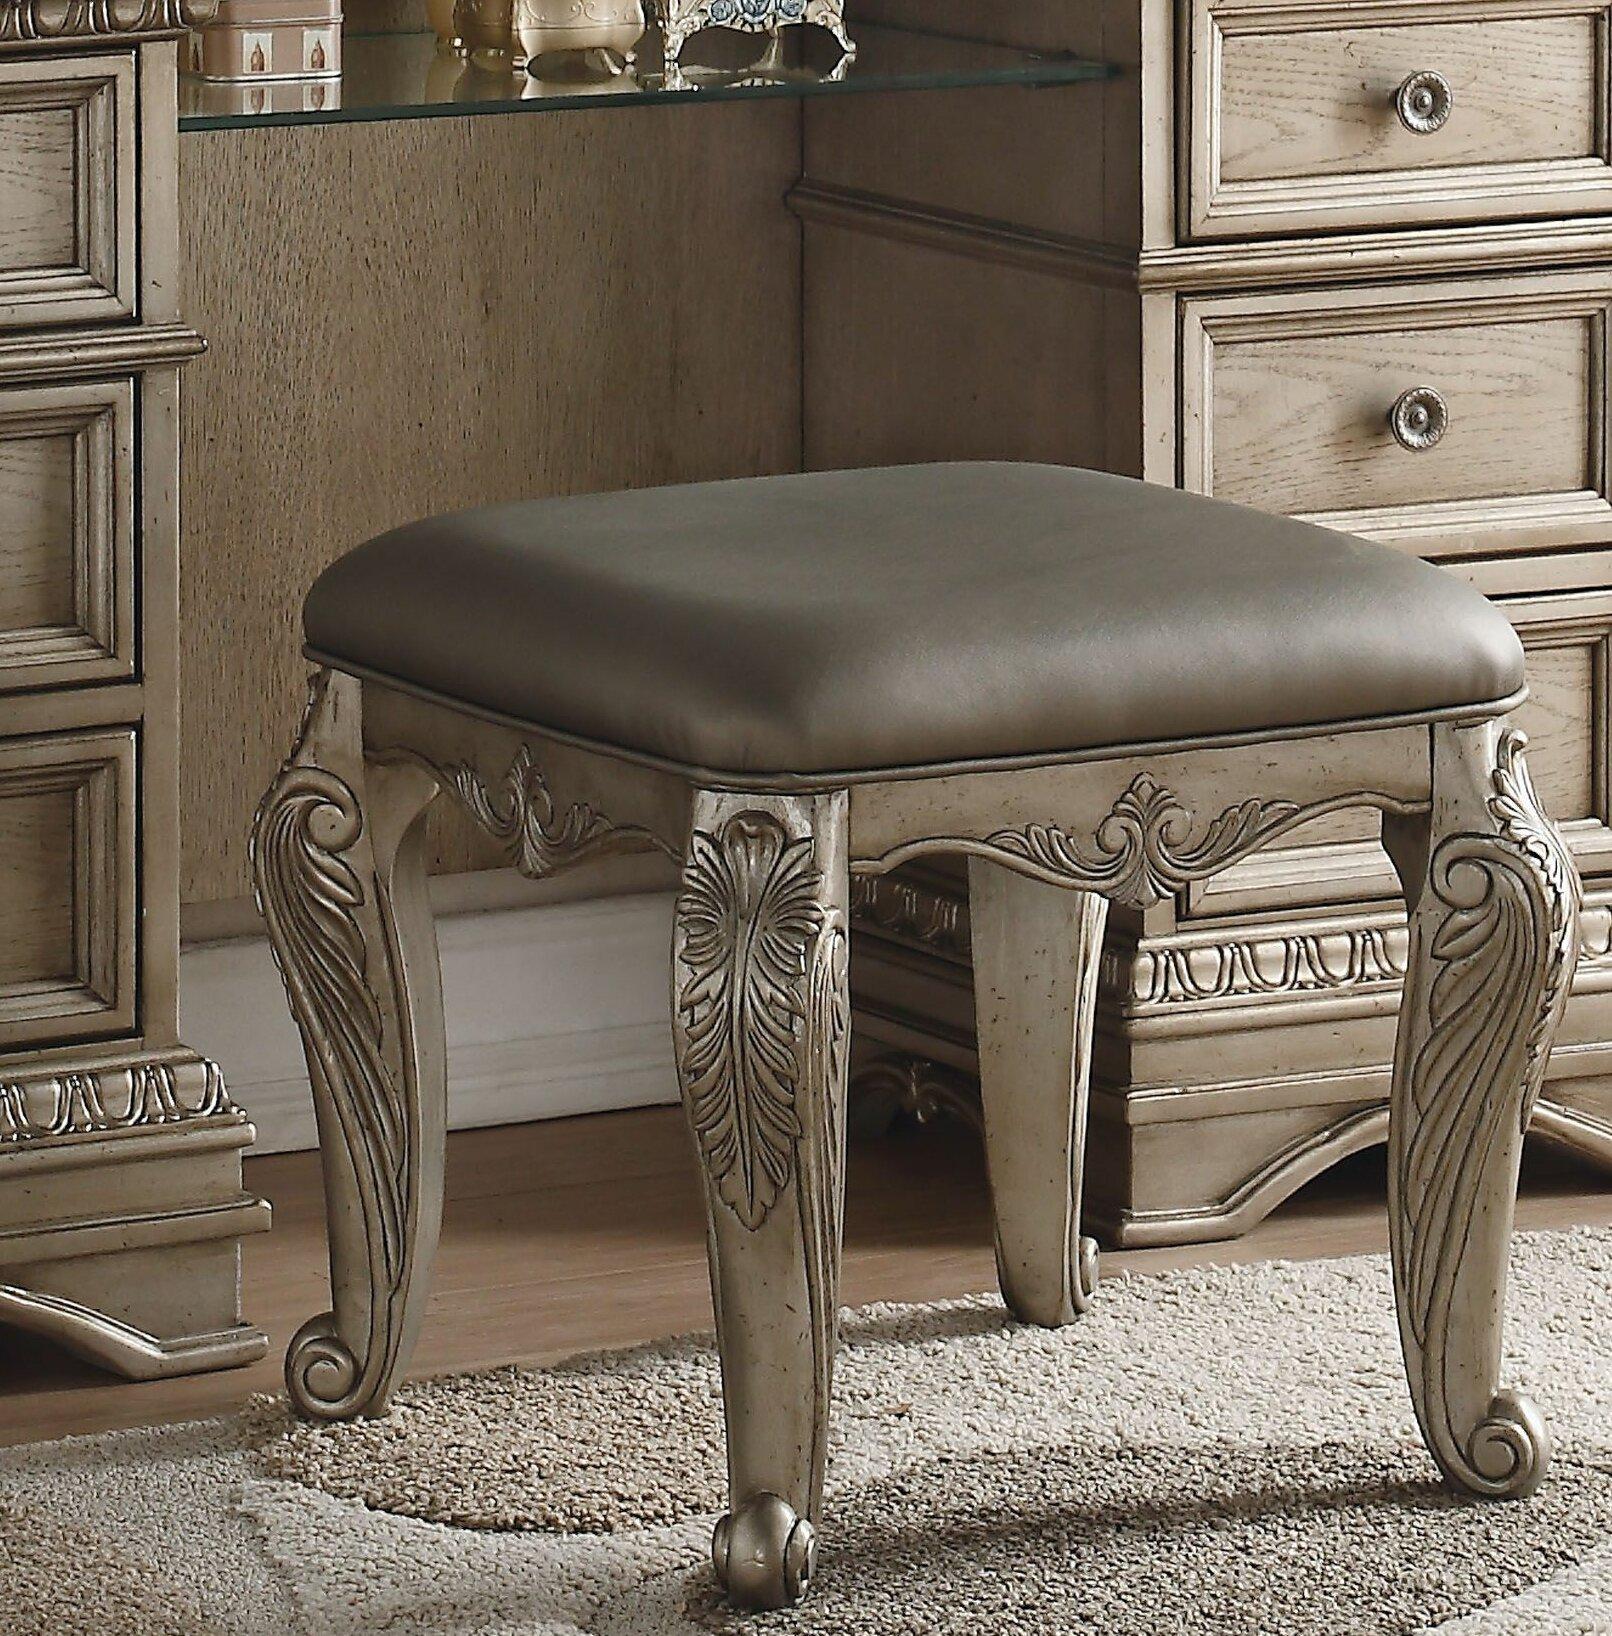 Incredible Senath Vanity Stool Unemploymentrelief Wooden Chair Designs For Living Room Unemploymentrelieforg